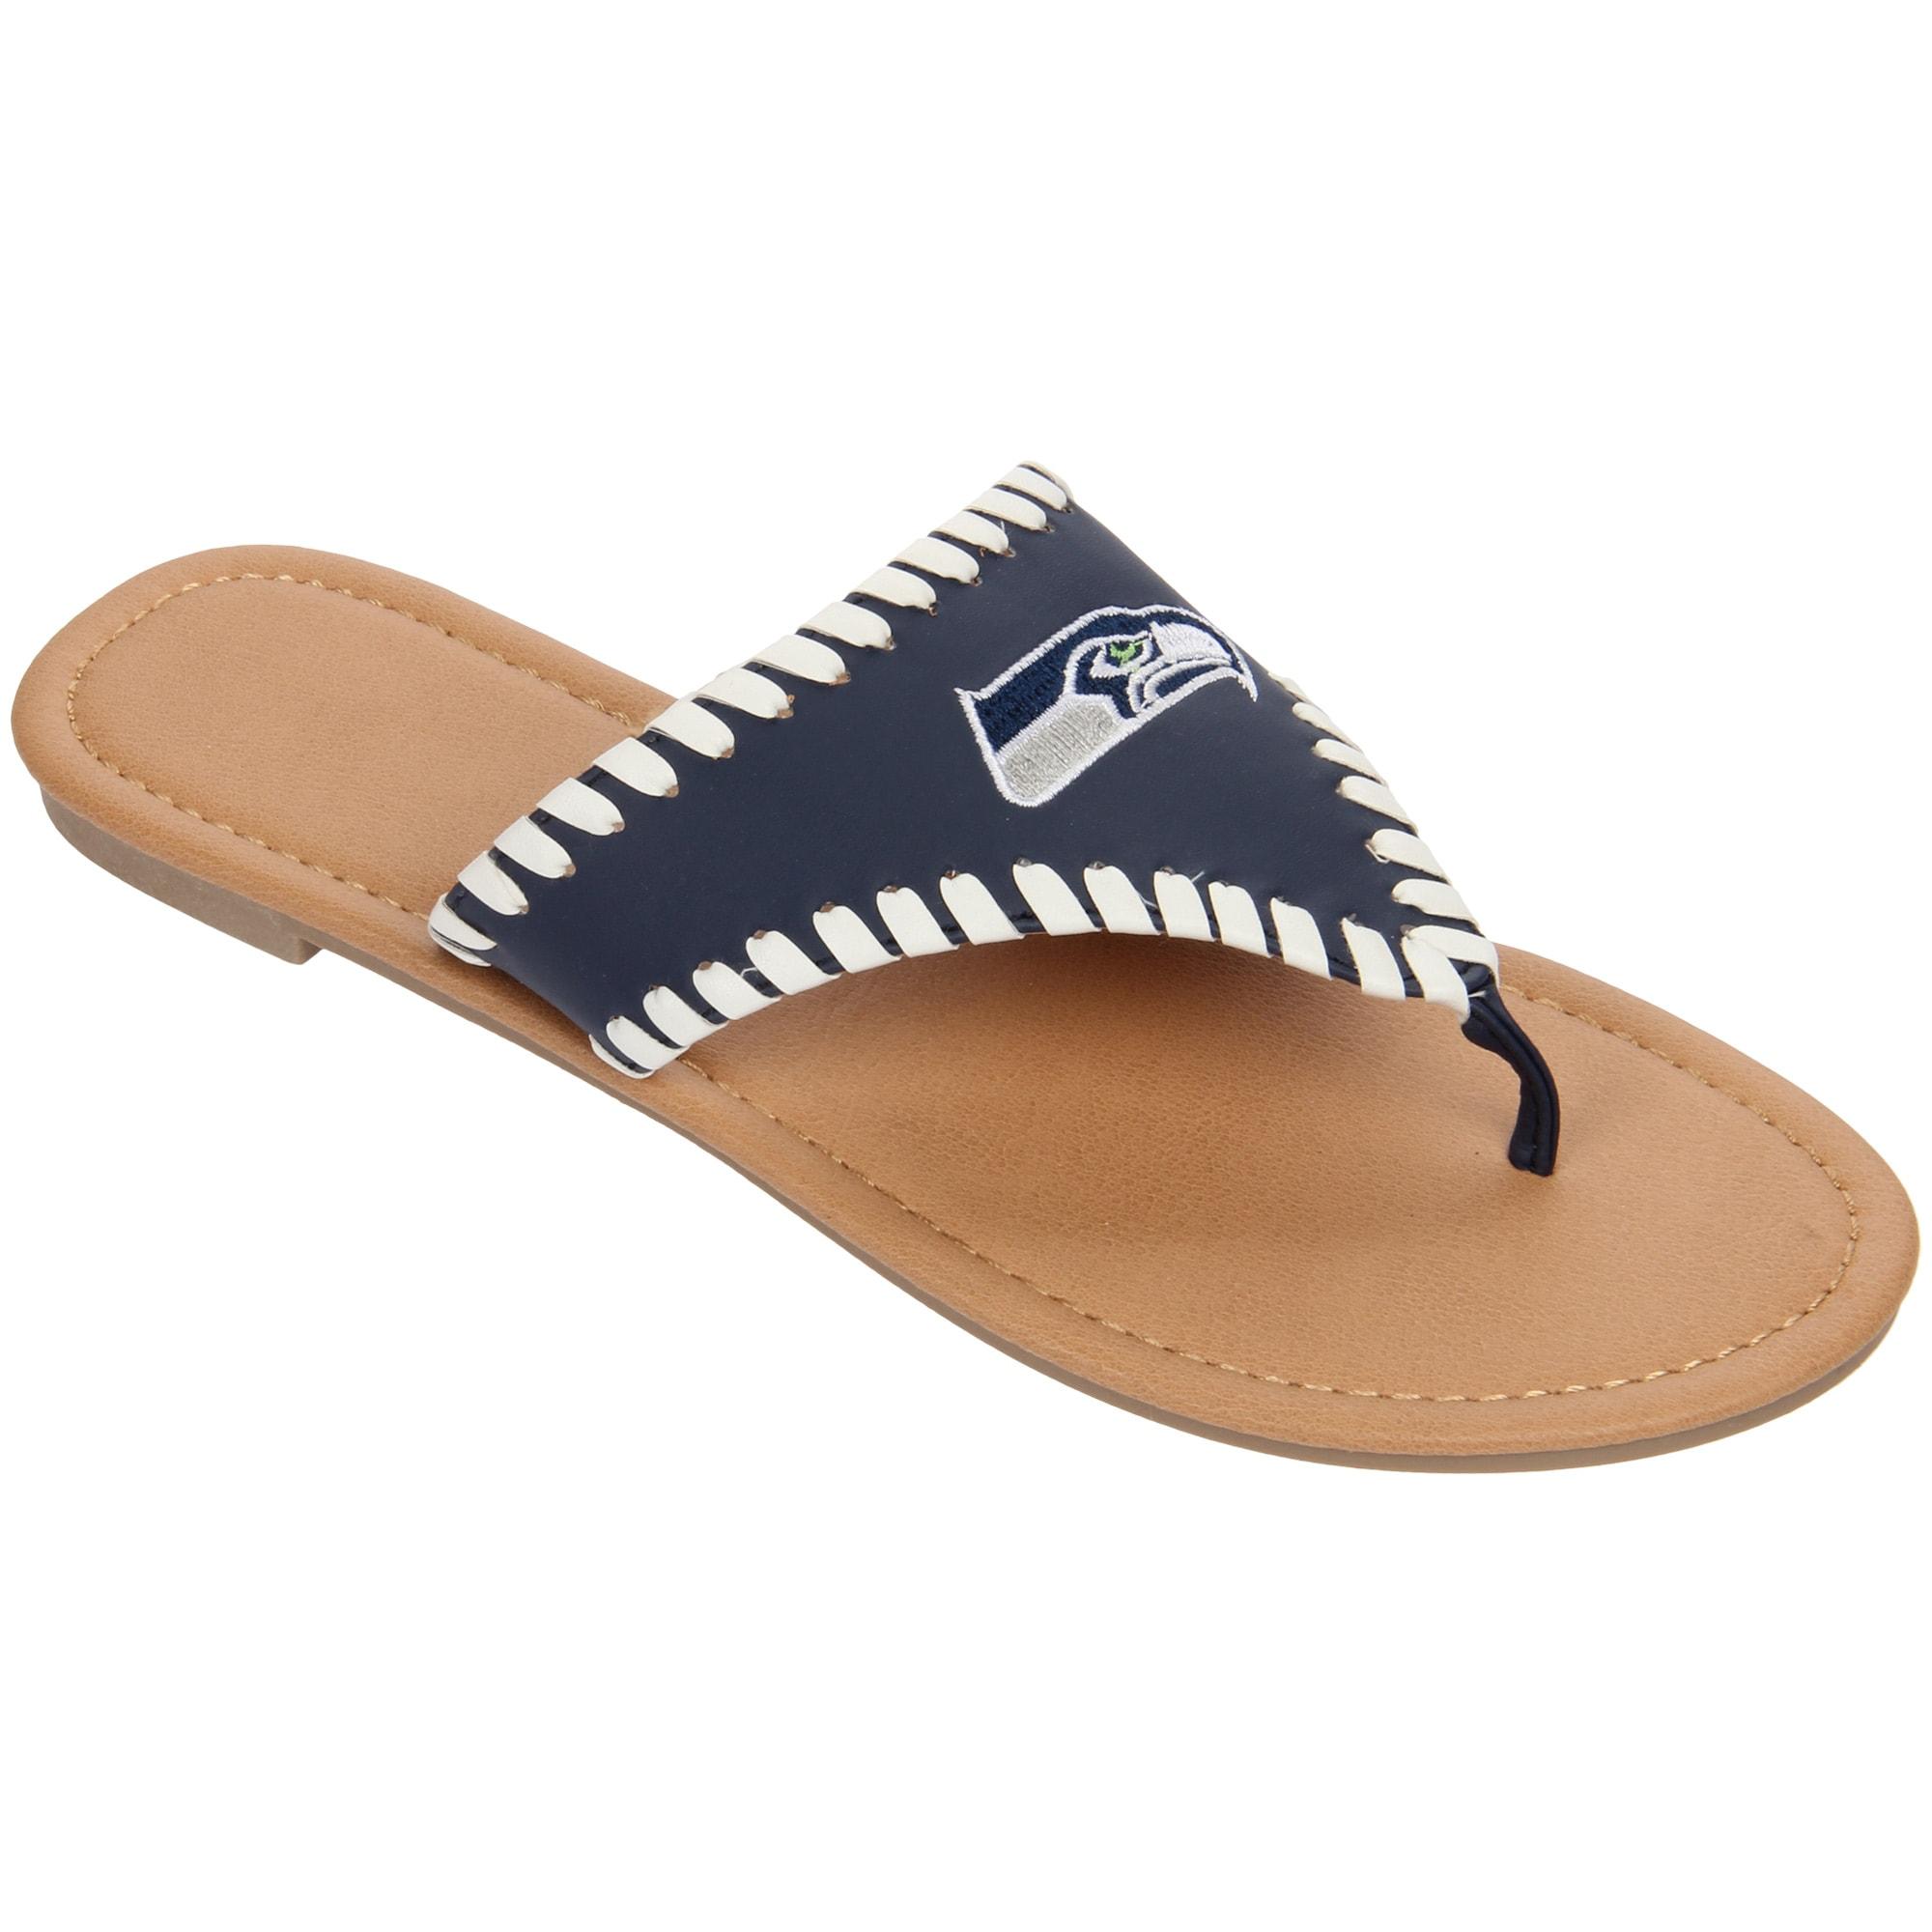 Seattle Seahawks Women's High End Sandals